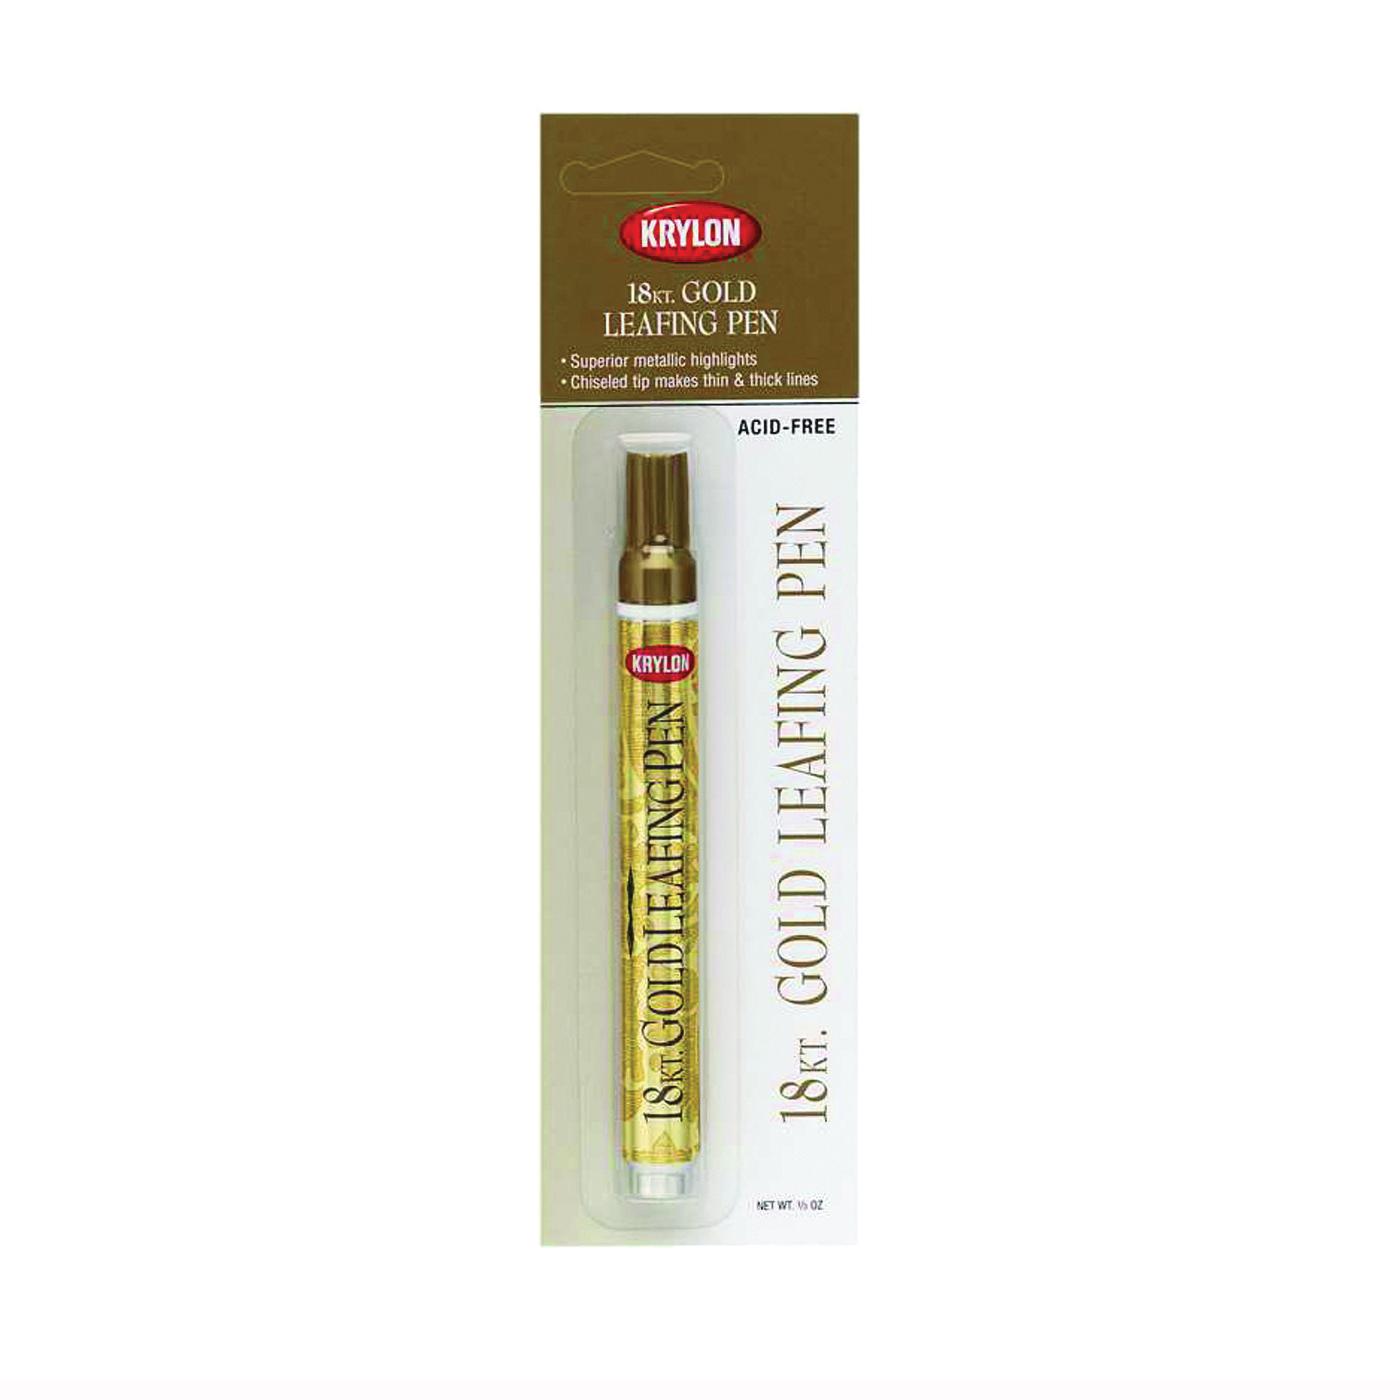 Picture of Krylon K09901A00 Leafing Pen, Gold, 0.33 oz Package